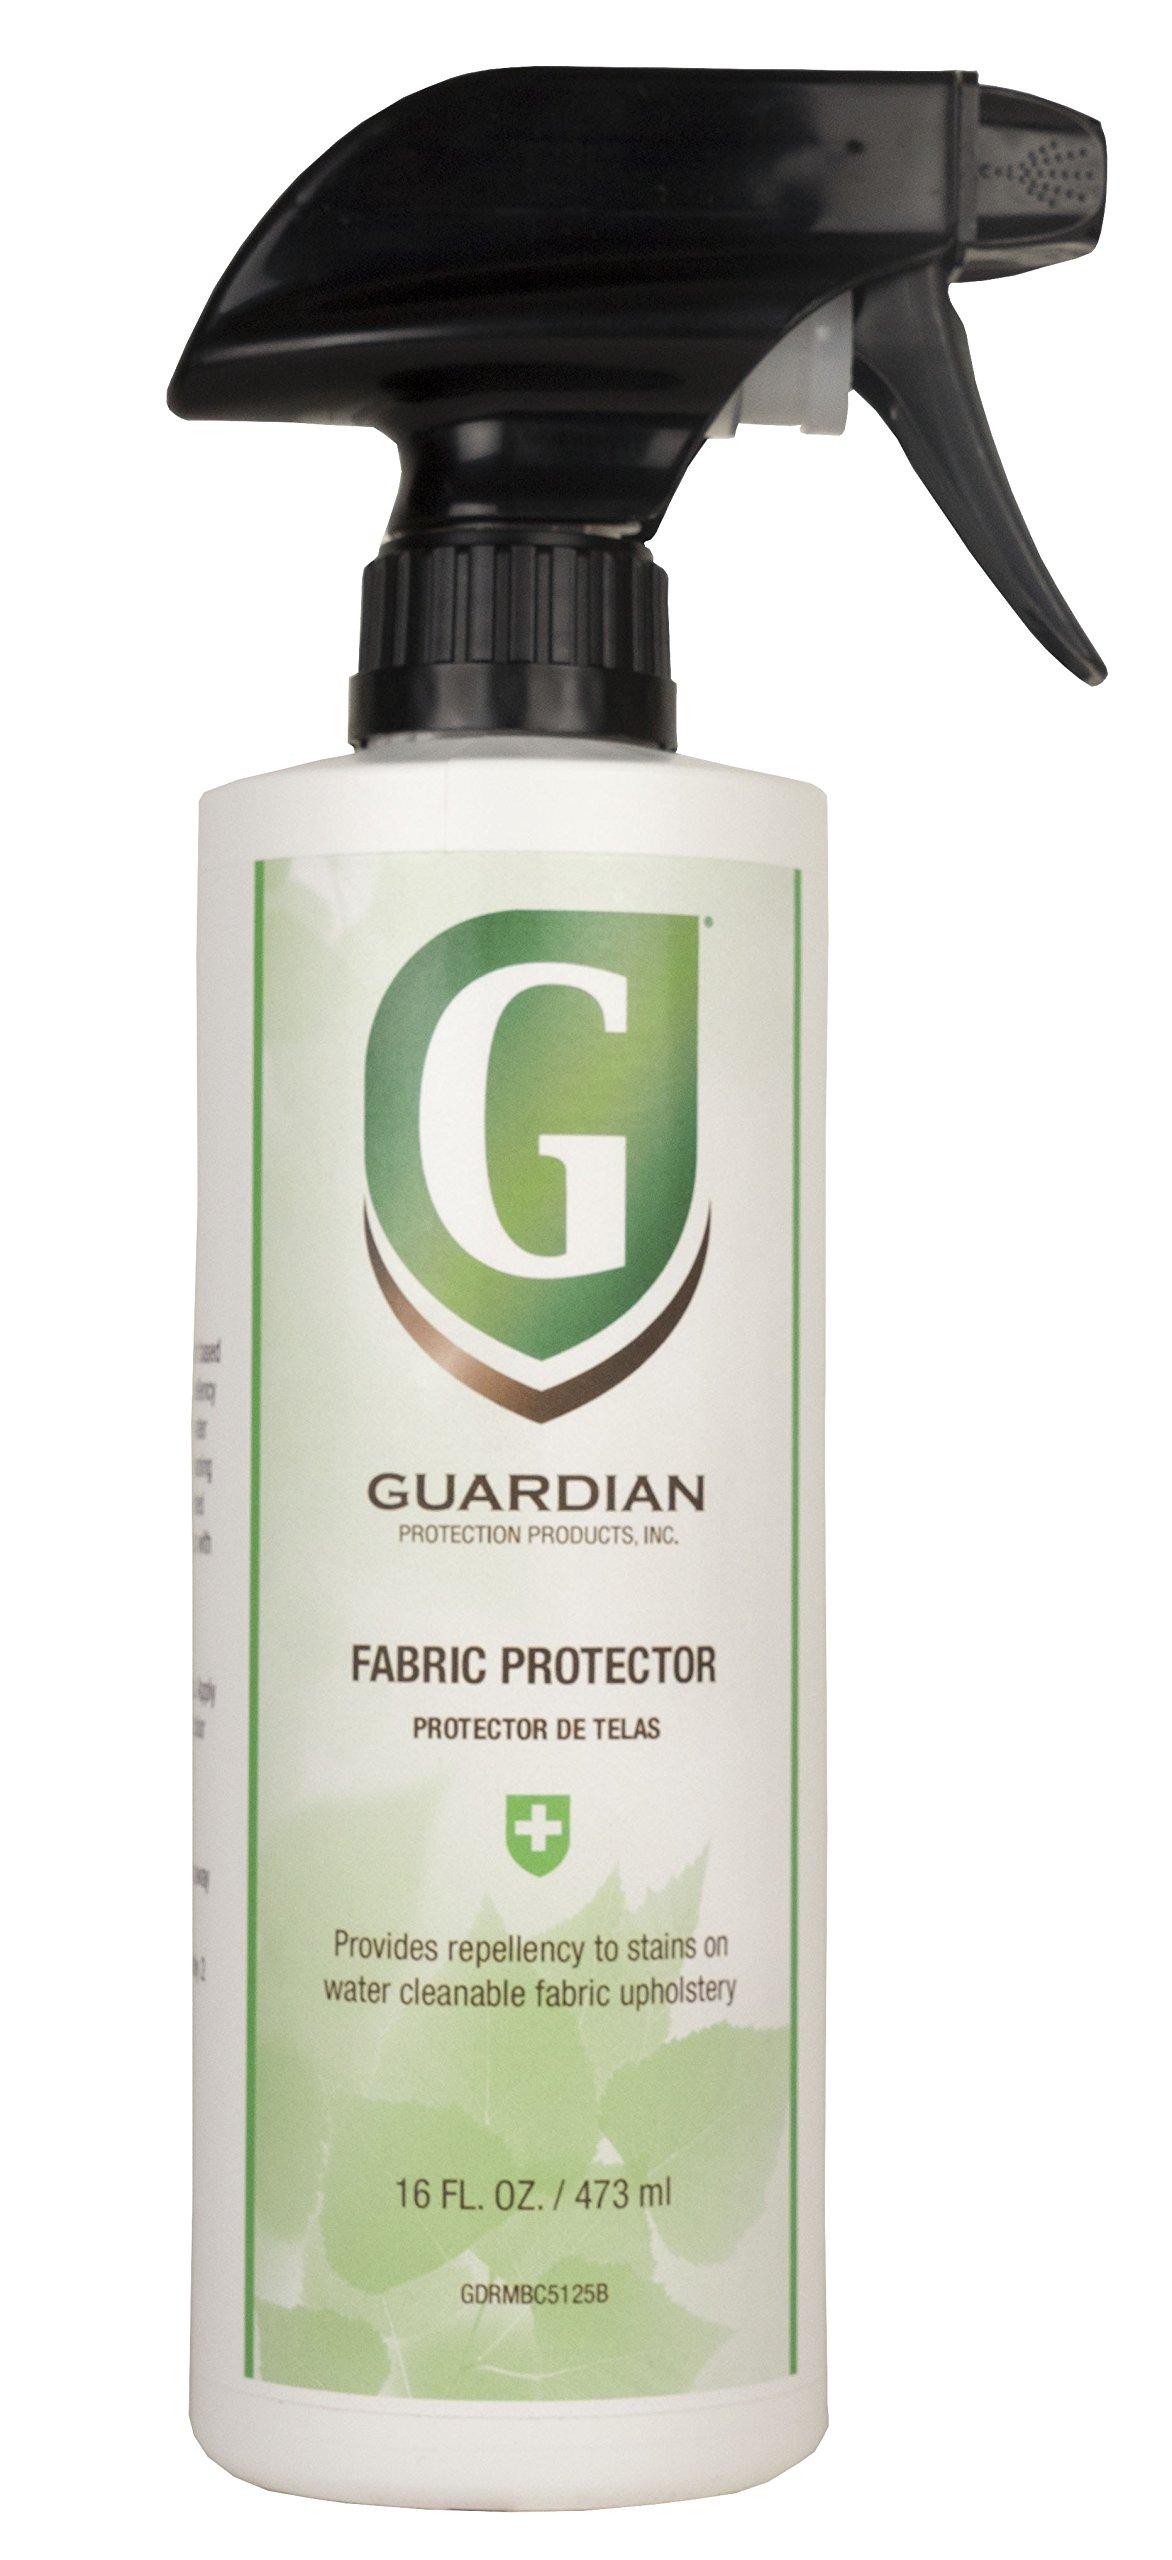 Guardian Fabric Protector - 16 oz